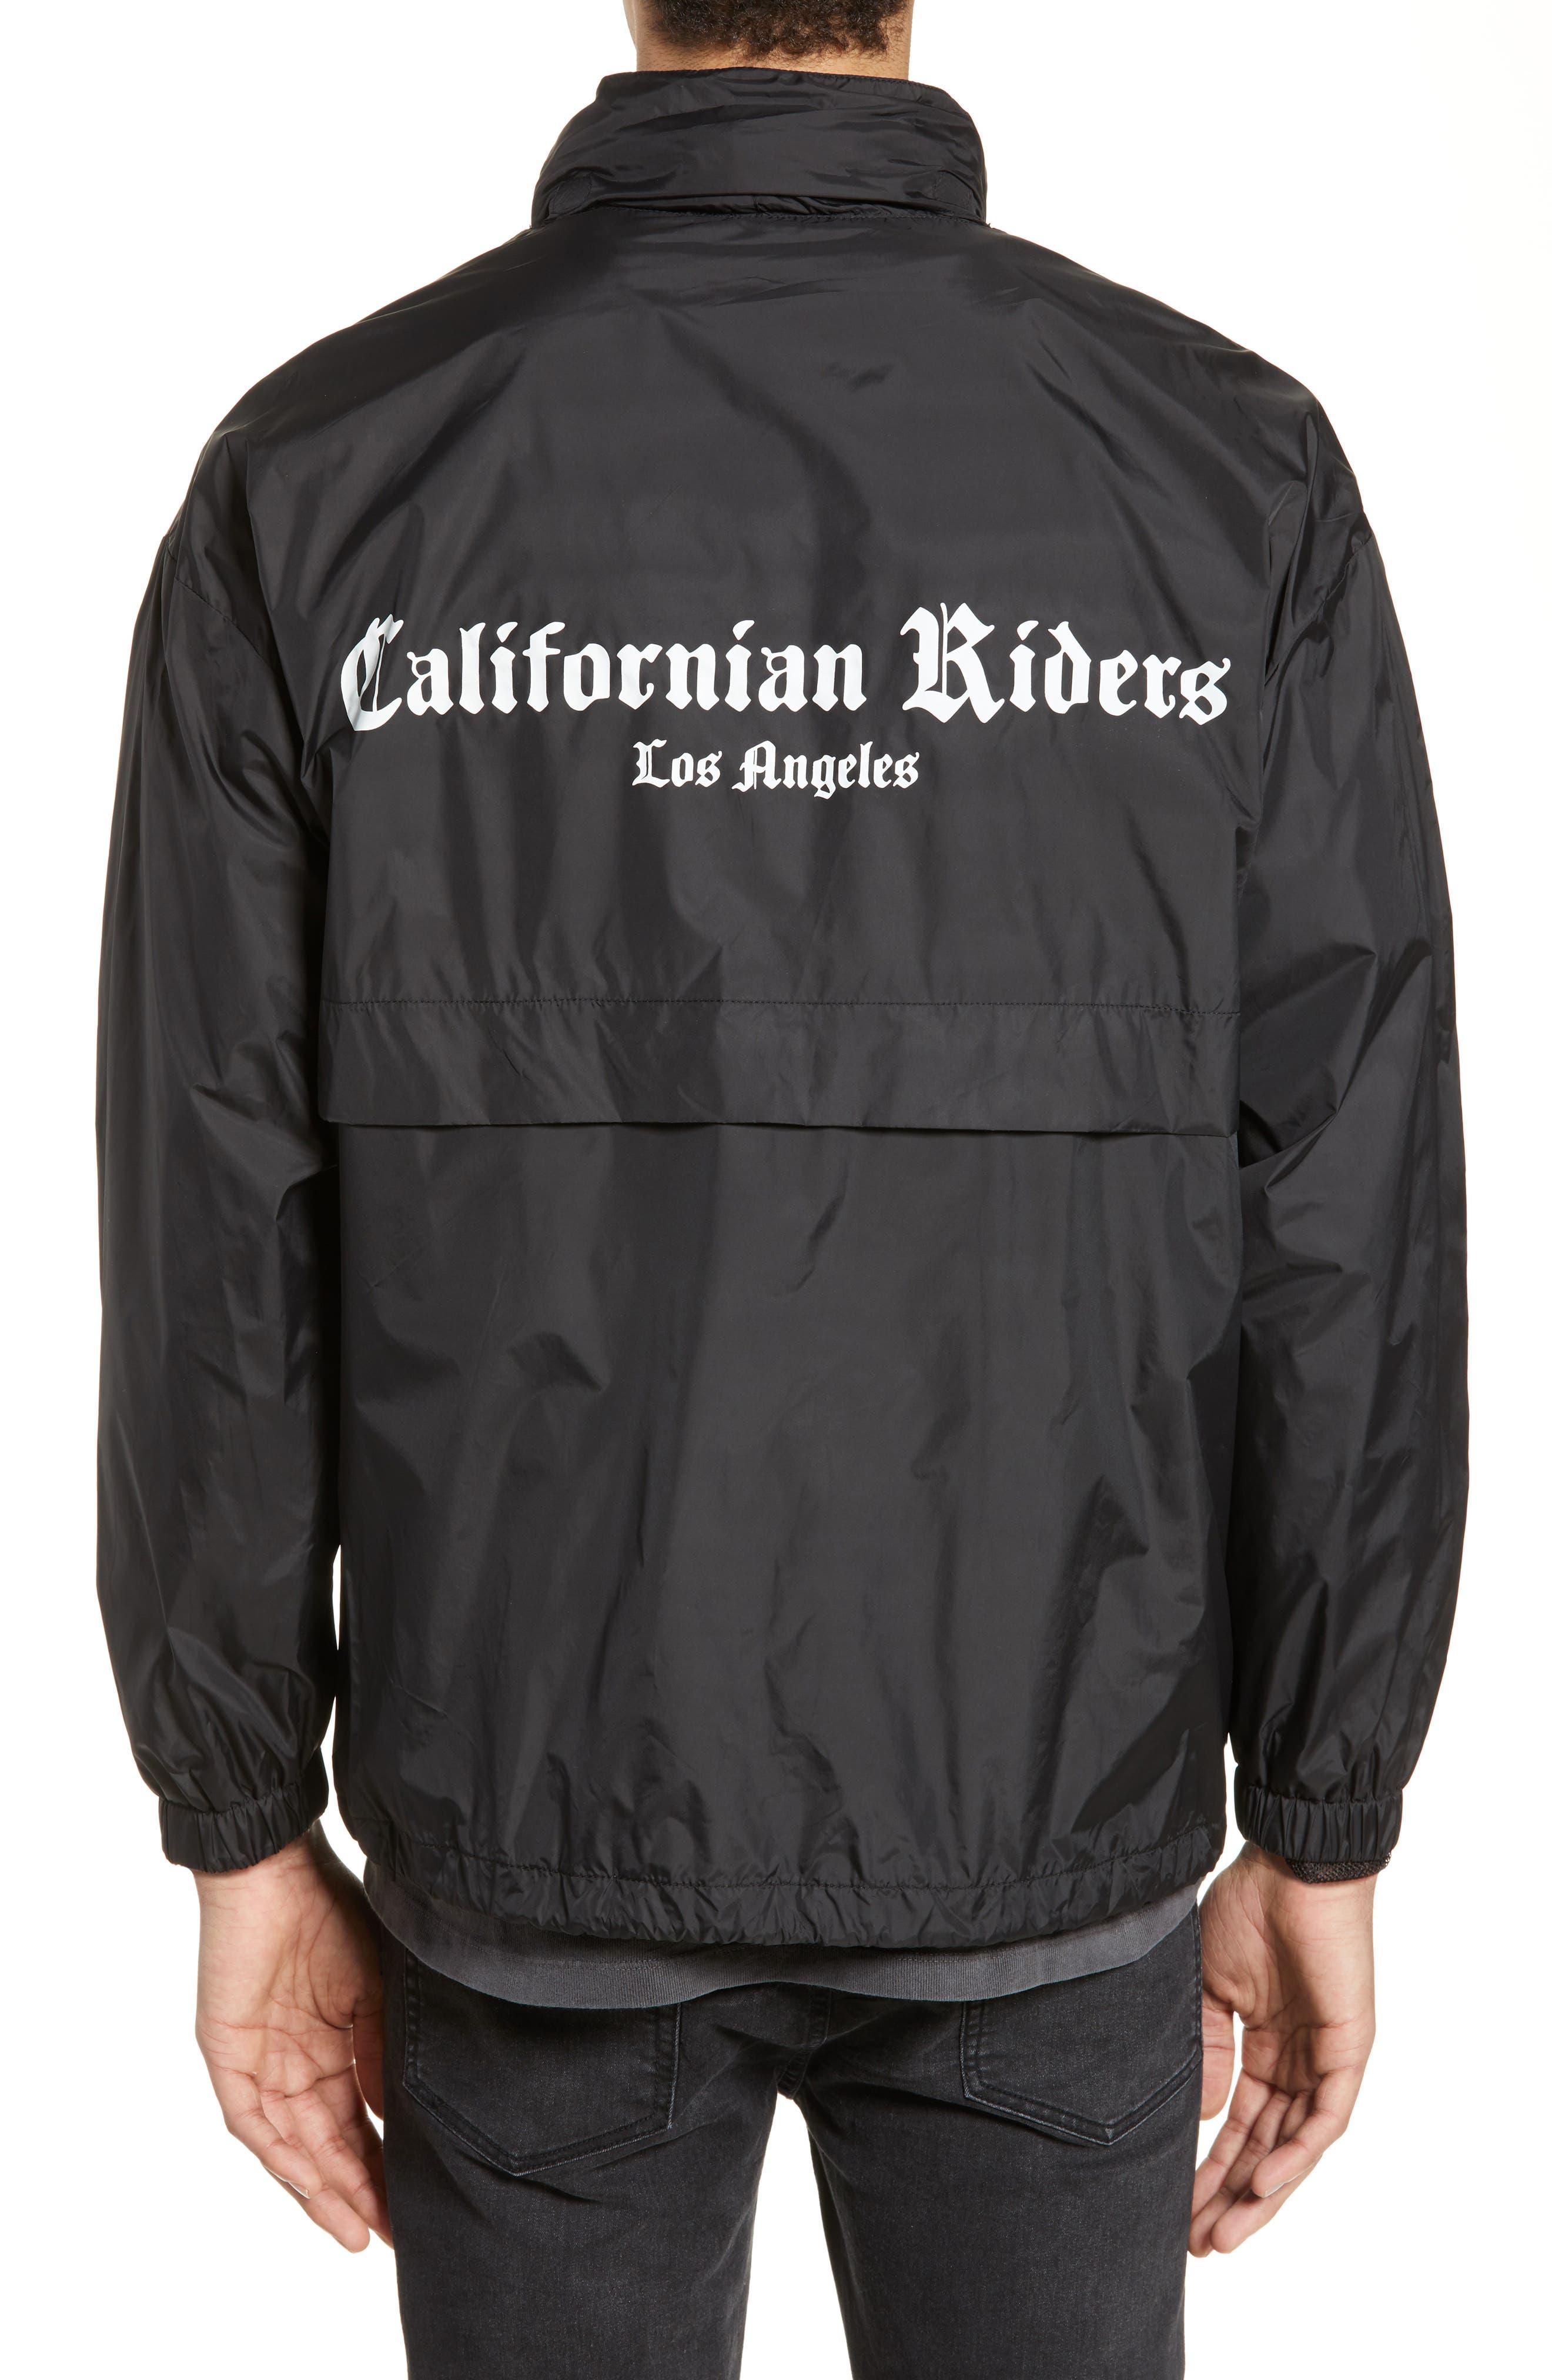 THE KOOPLES, Californian Riders Print Jacket, Alternate thumbnail 2, color, 001